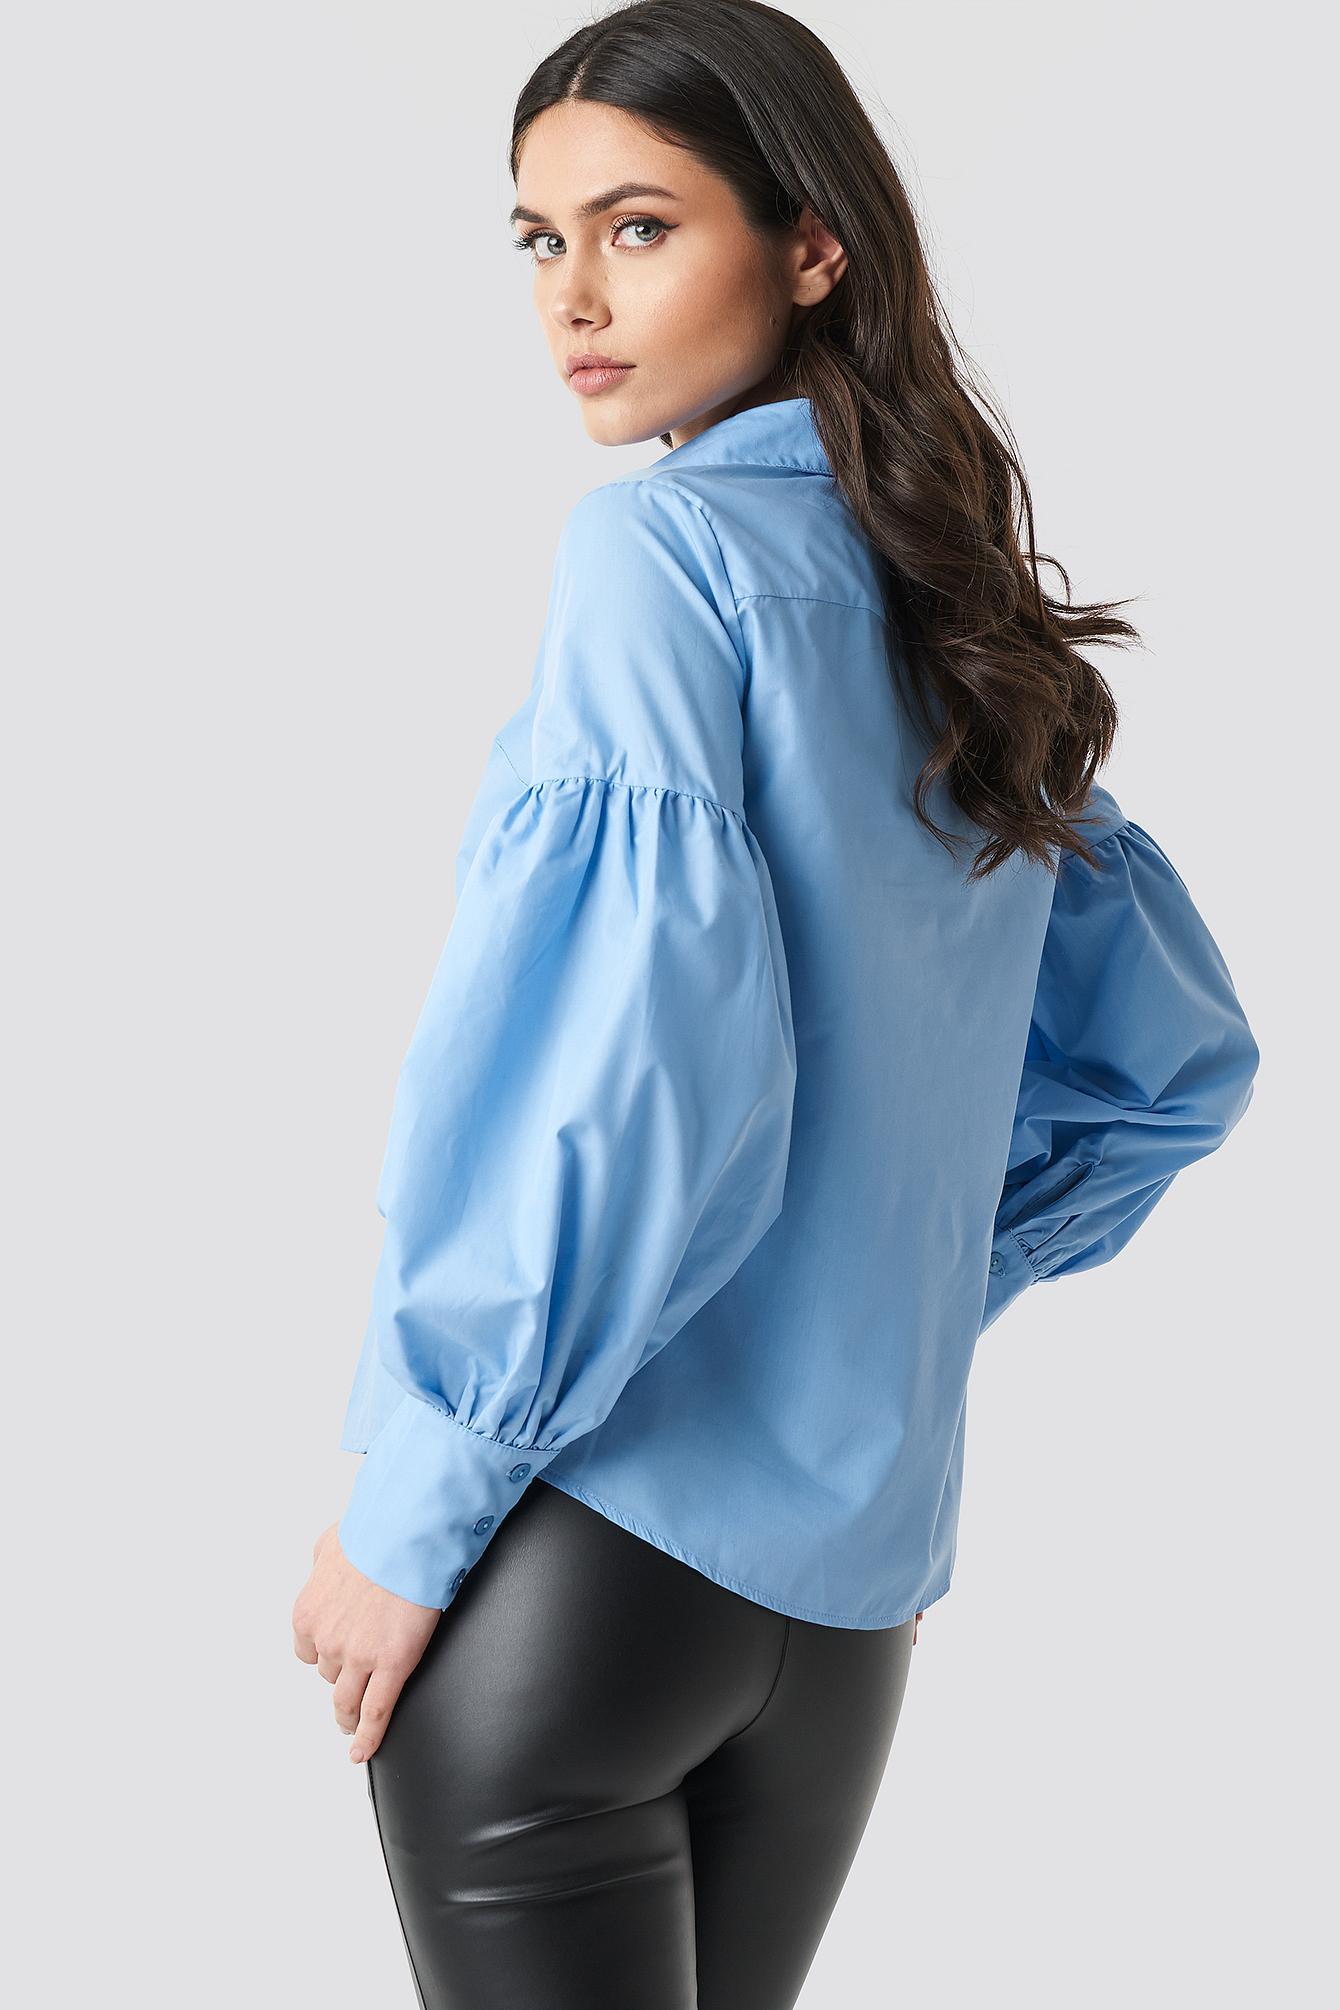 cad94e71a4357 Trendyol Milla Balloon Sleeve Shirt Blue in Blue - Lyst